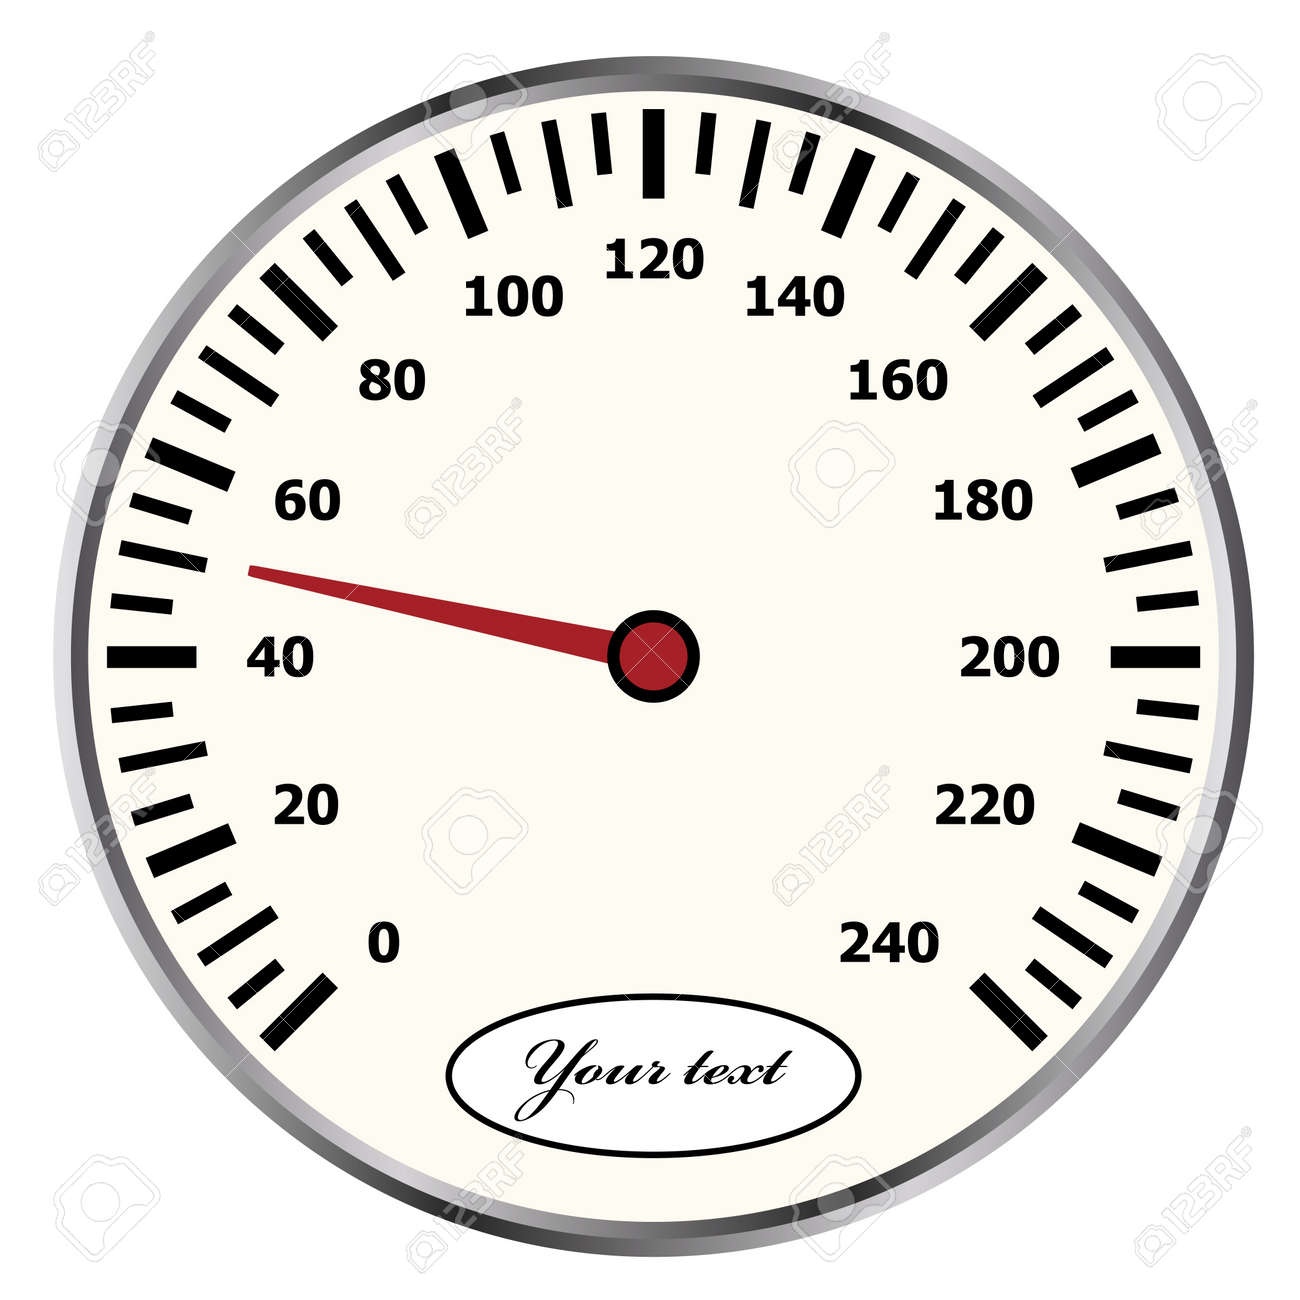 vector speedometer royalty free cliparts vectors and stock rh 123rf com speedometer vector png vector speedometer manual